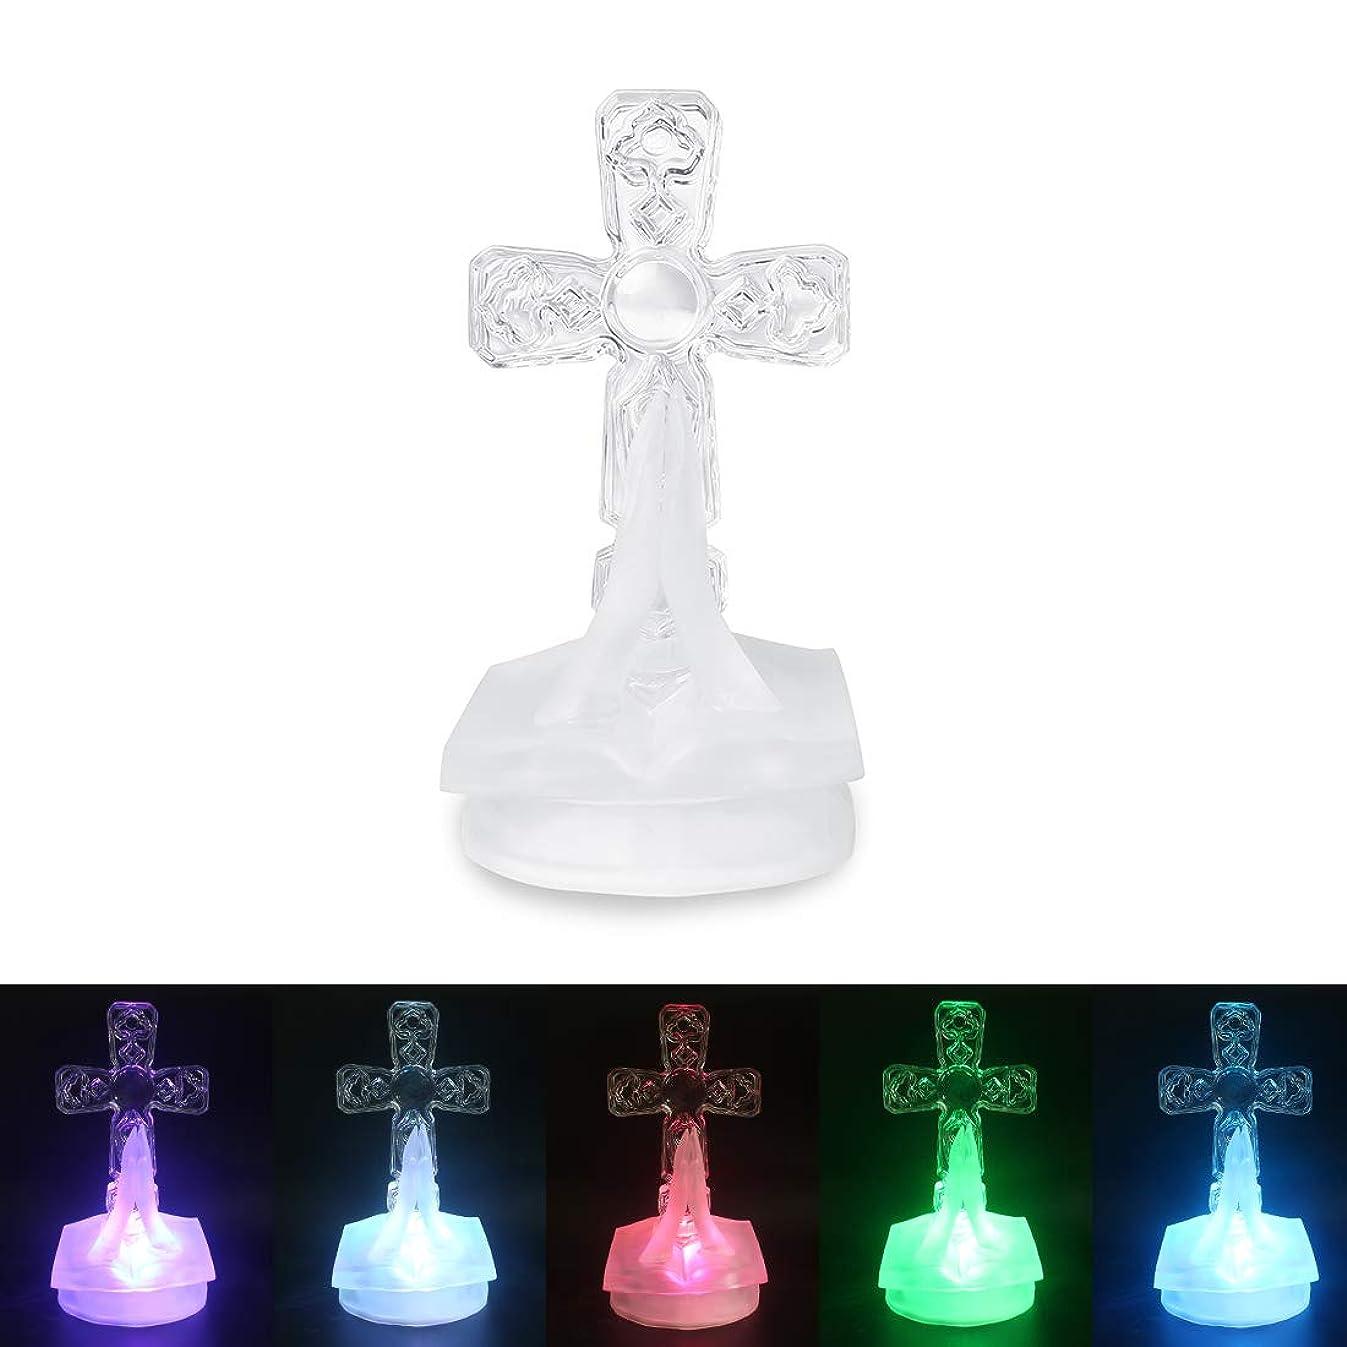 ARTITAN Decoration Lights Crystal Cross Figurine 6in Length LED Lamp for Home Office Bedroom Decor